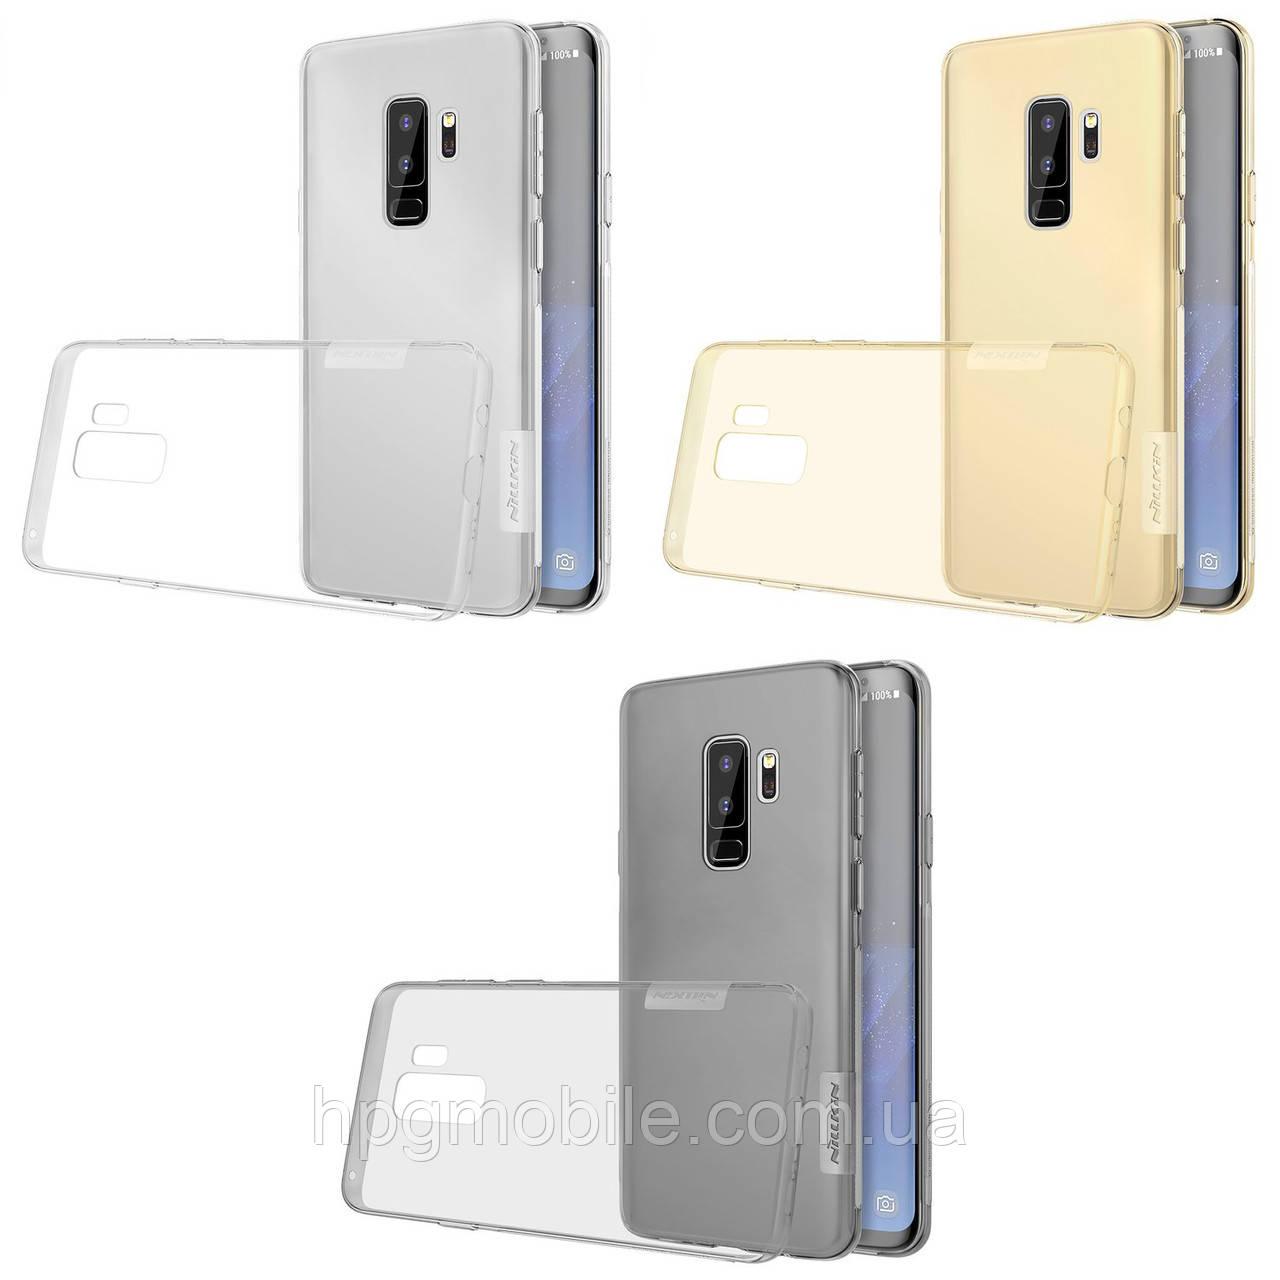 Купить Чехол для Samsung Galaxy S9 Plus G965 (2018) - Nillkin Nature TPU Case, Ultra Slim, силикон